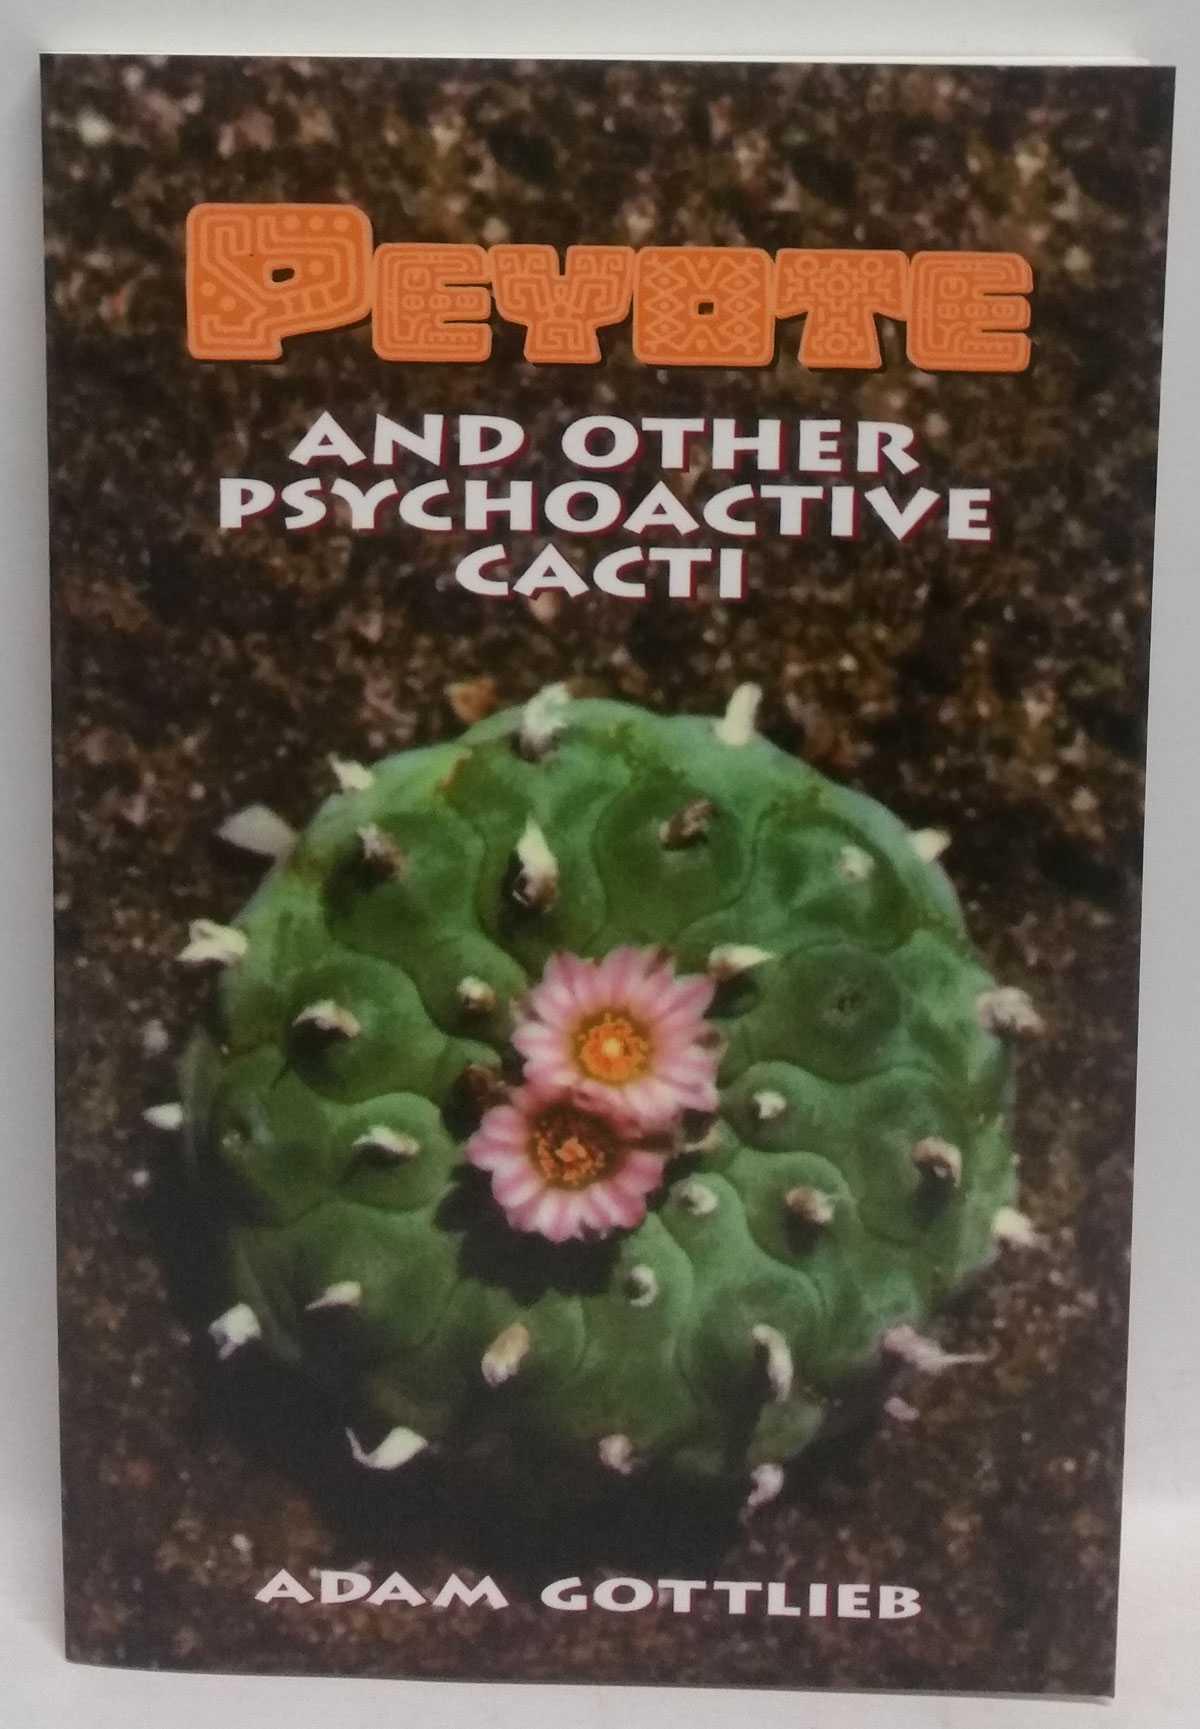 Peyote and Other Psychoactive Cacti, Adam Gottlieb